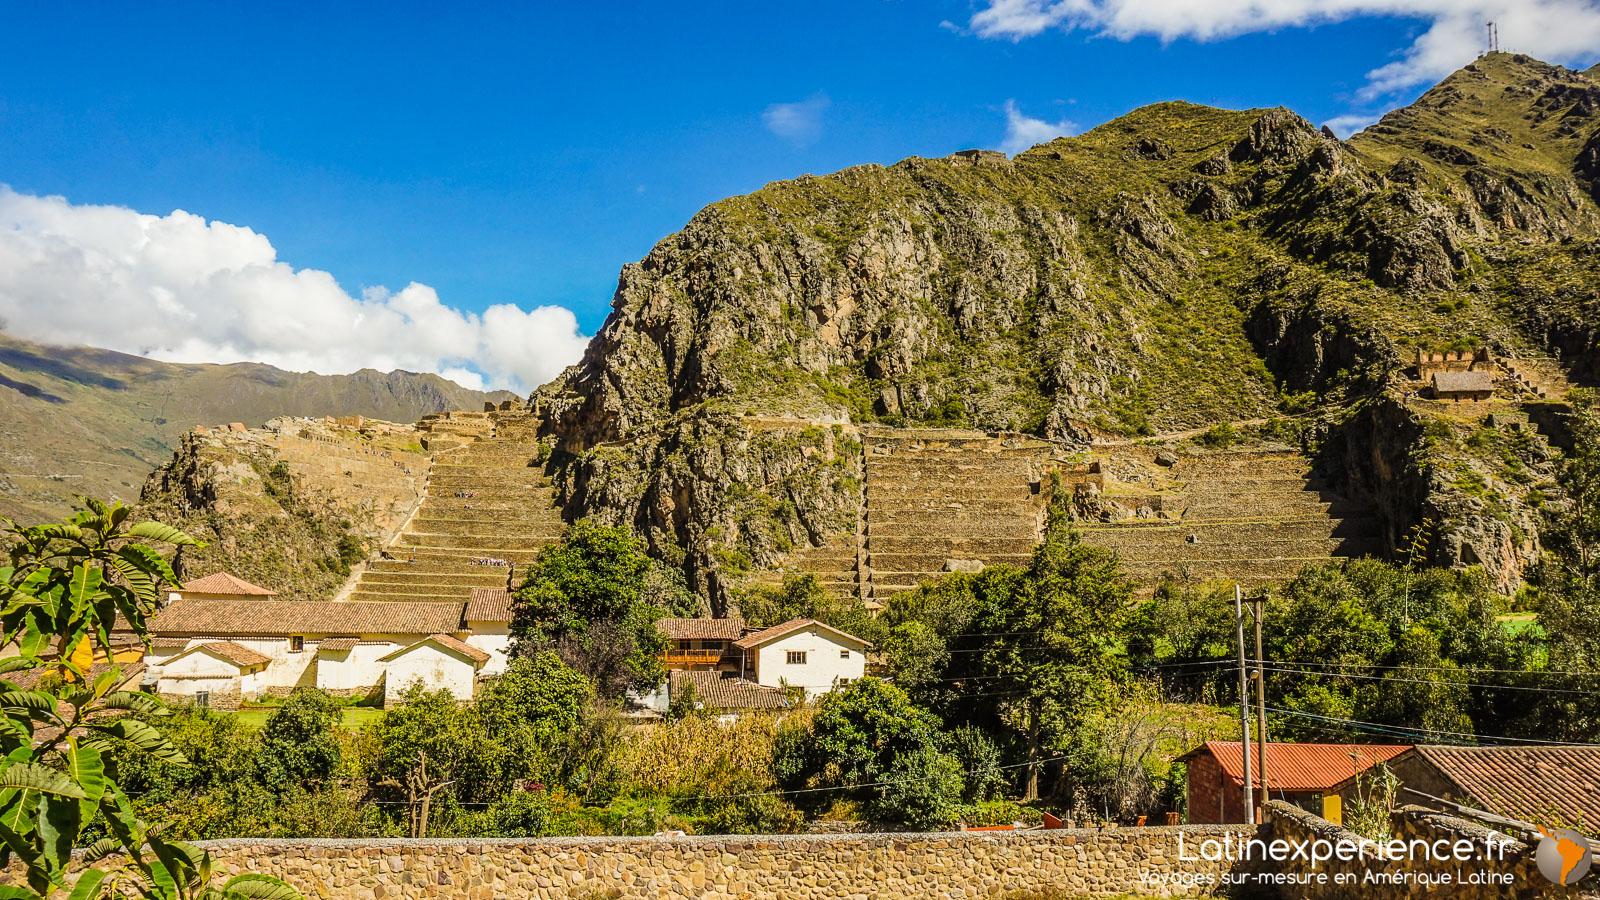 Pérou - Road Trip - Ollantaytambo - Latinexperience voyages